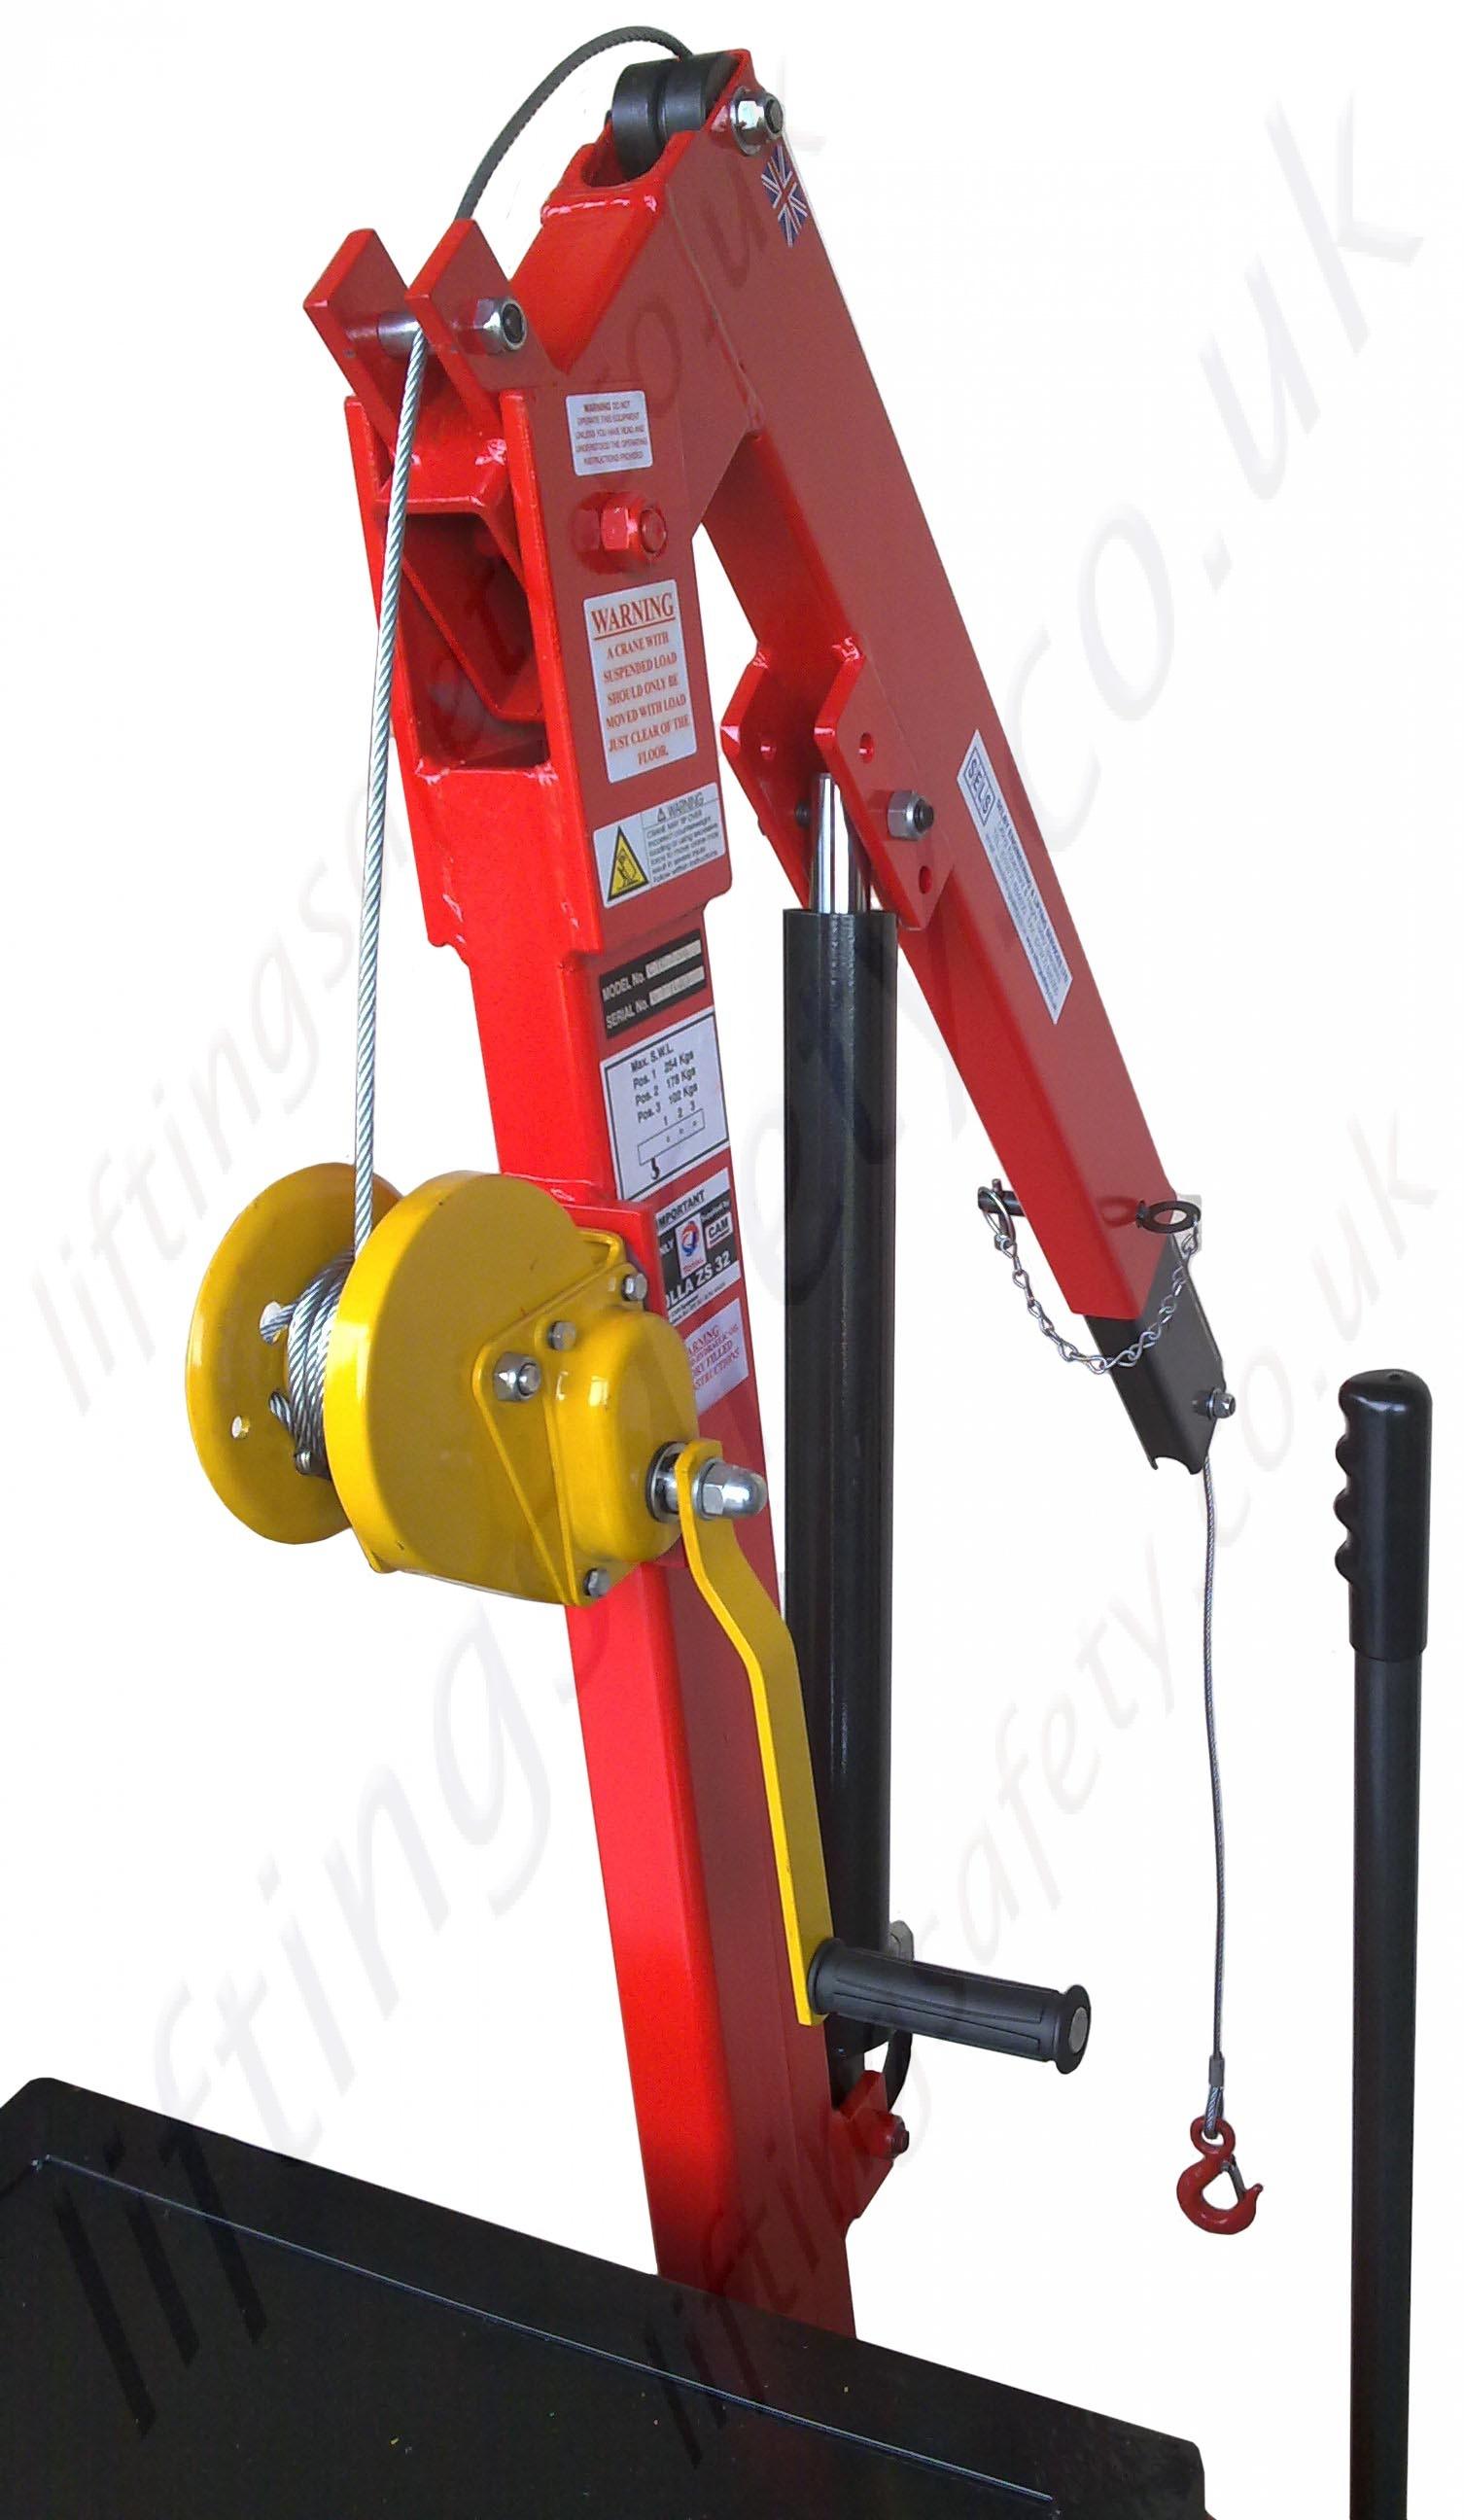 Pivoting Arm Counterbalance Workshop Floor Crane With